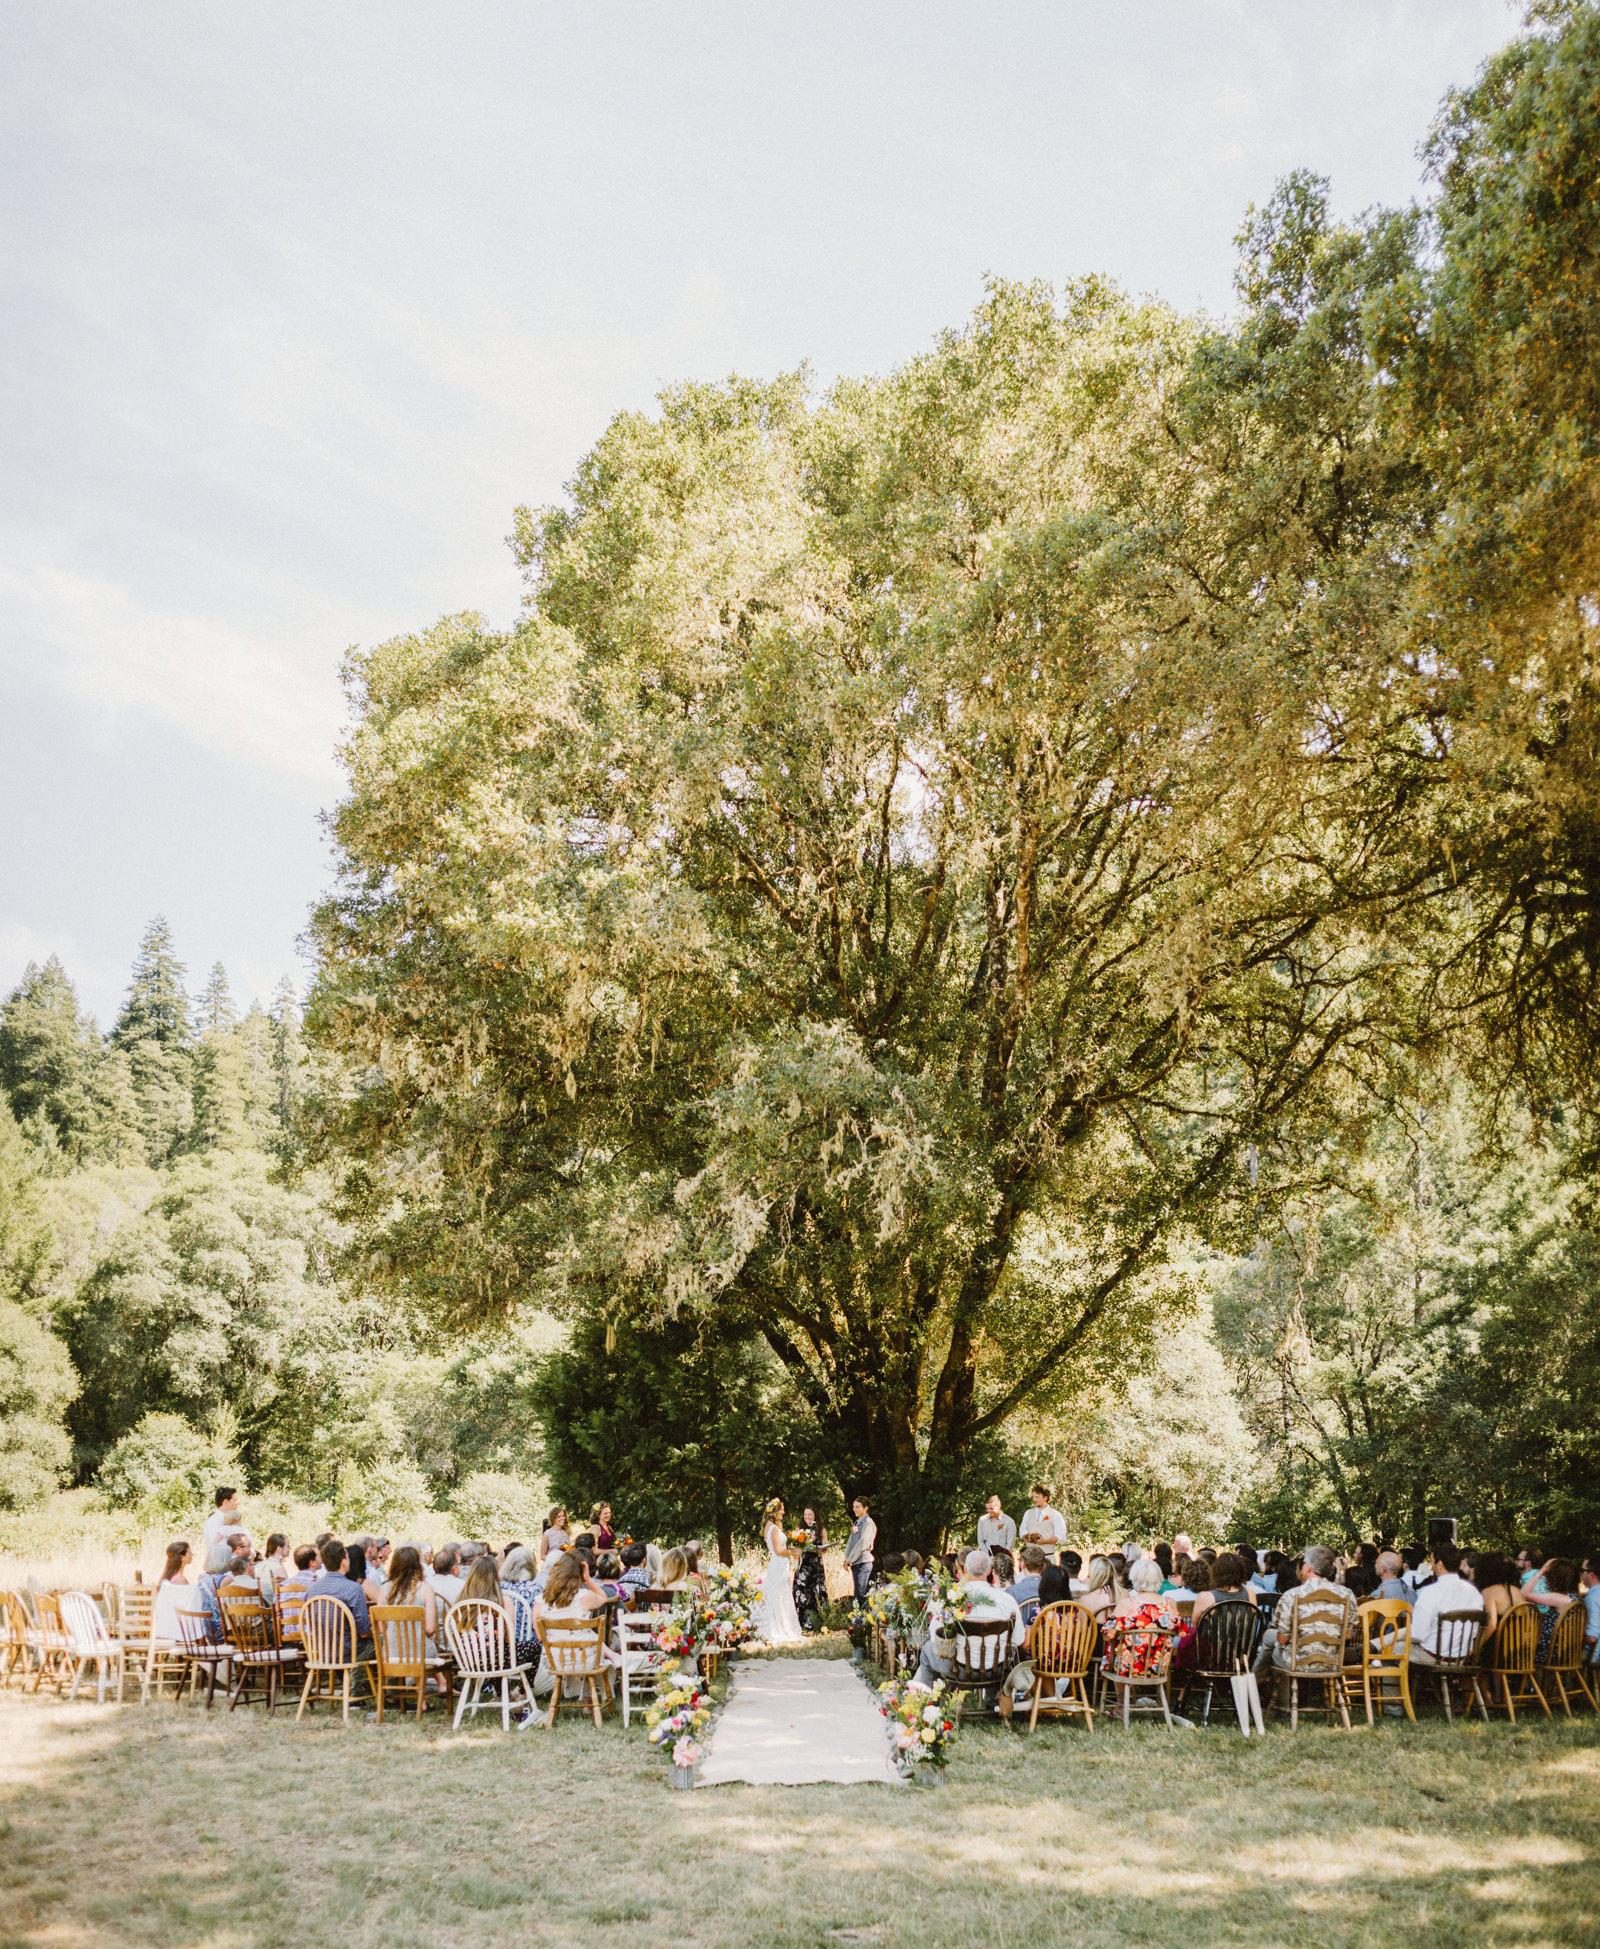 rivers-bend-retreat-wedding-022 RIVER'S BEND RETREAT WEDDING